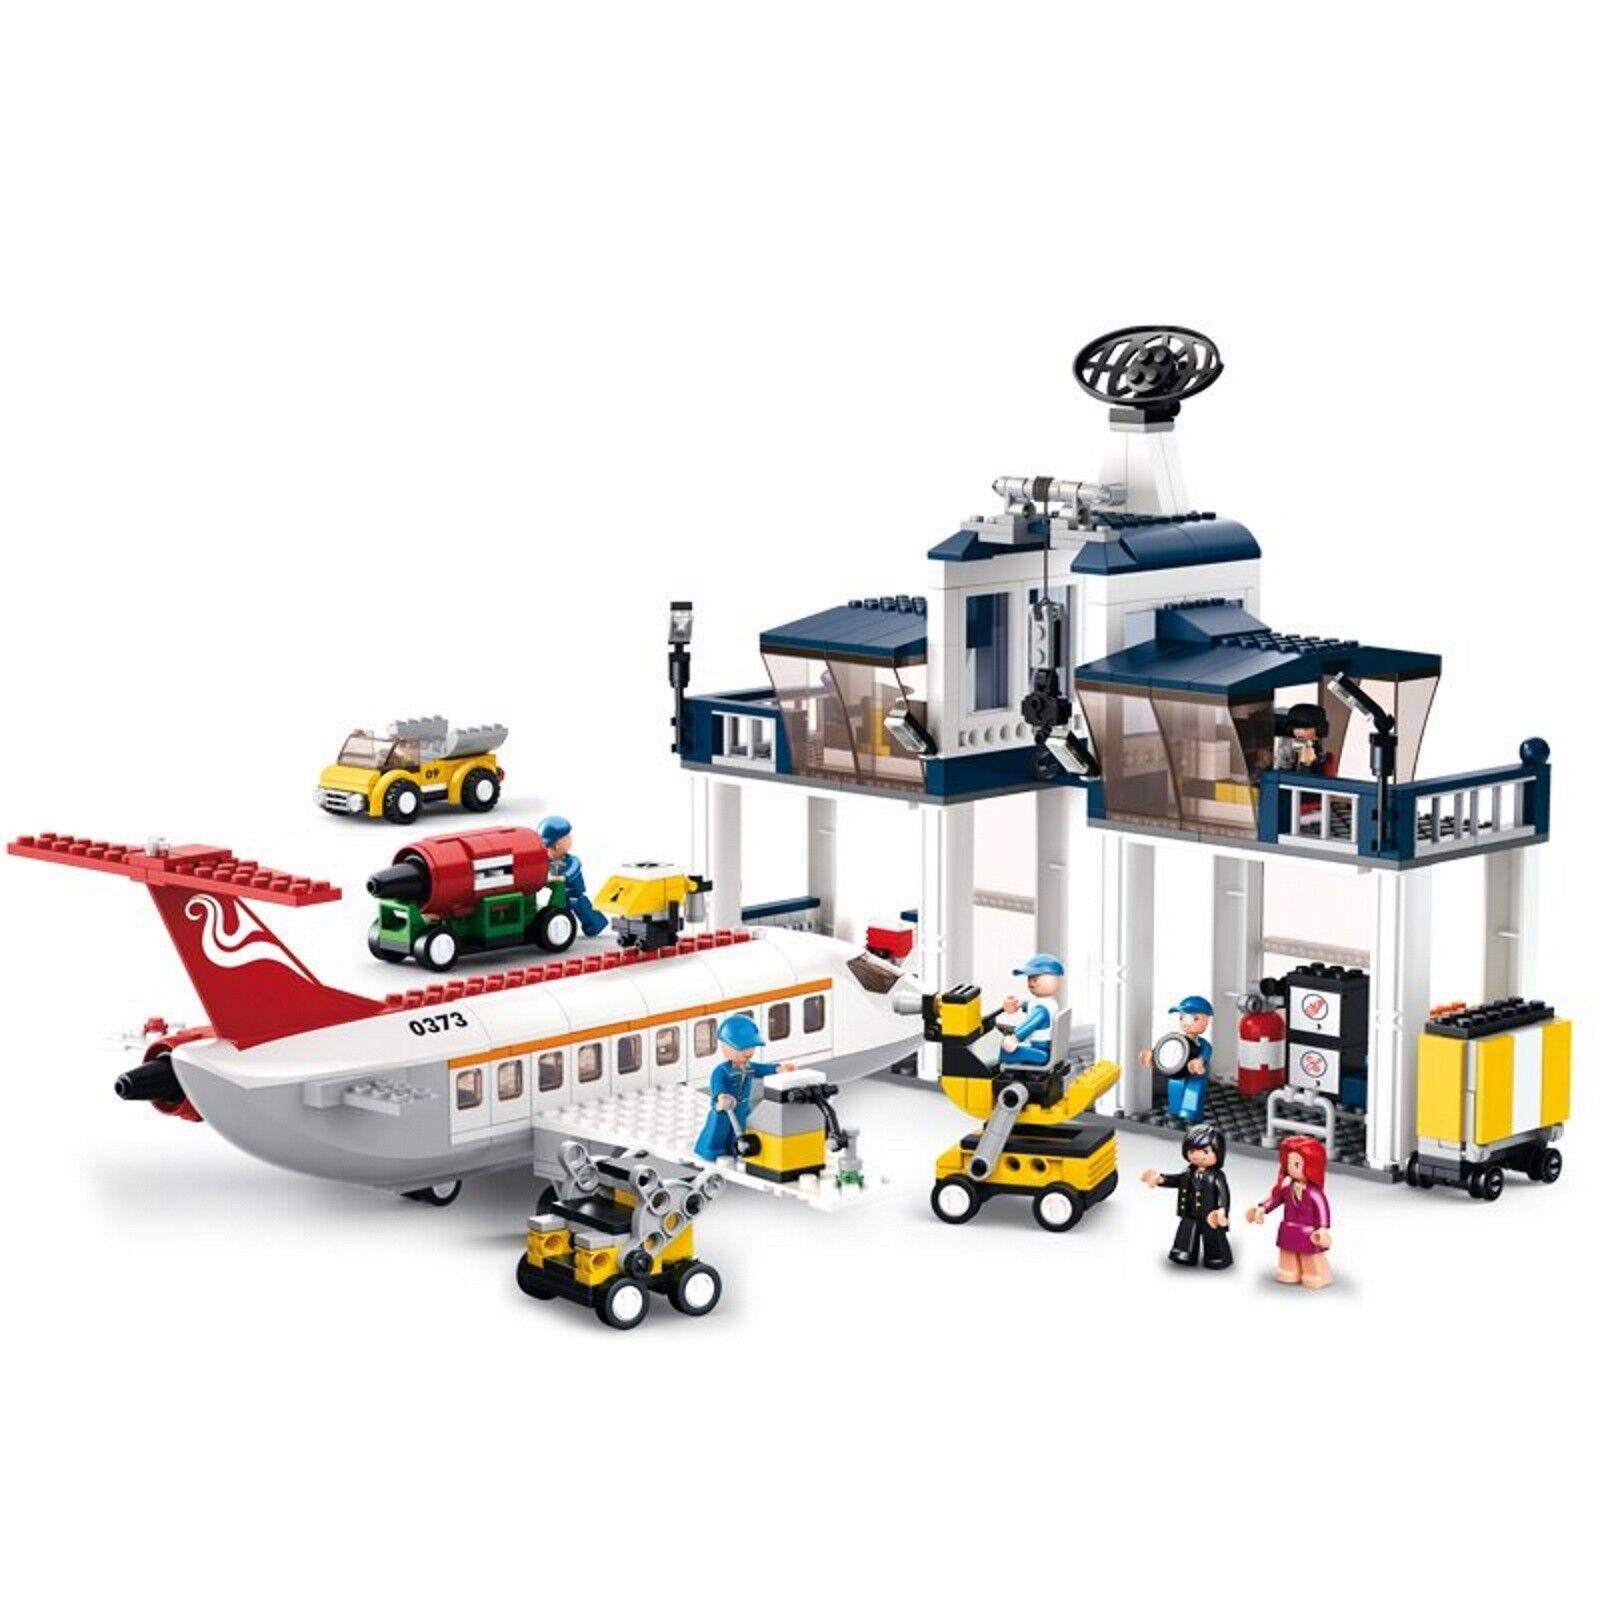 Sluban Airport with Passenger Plane M38-B0373